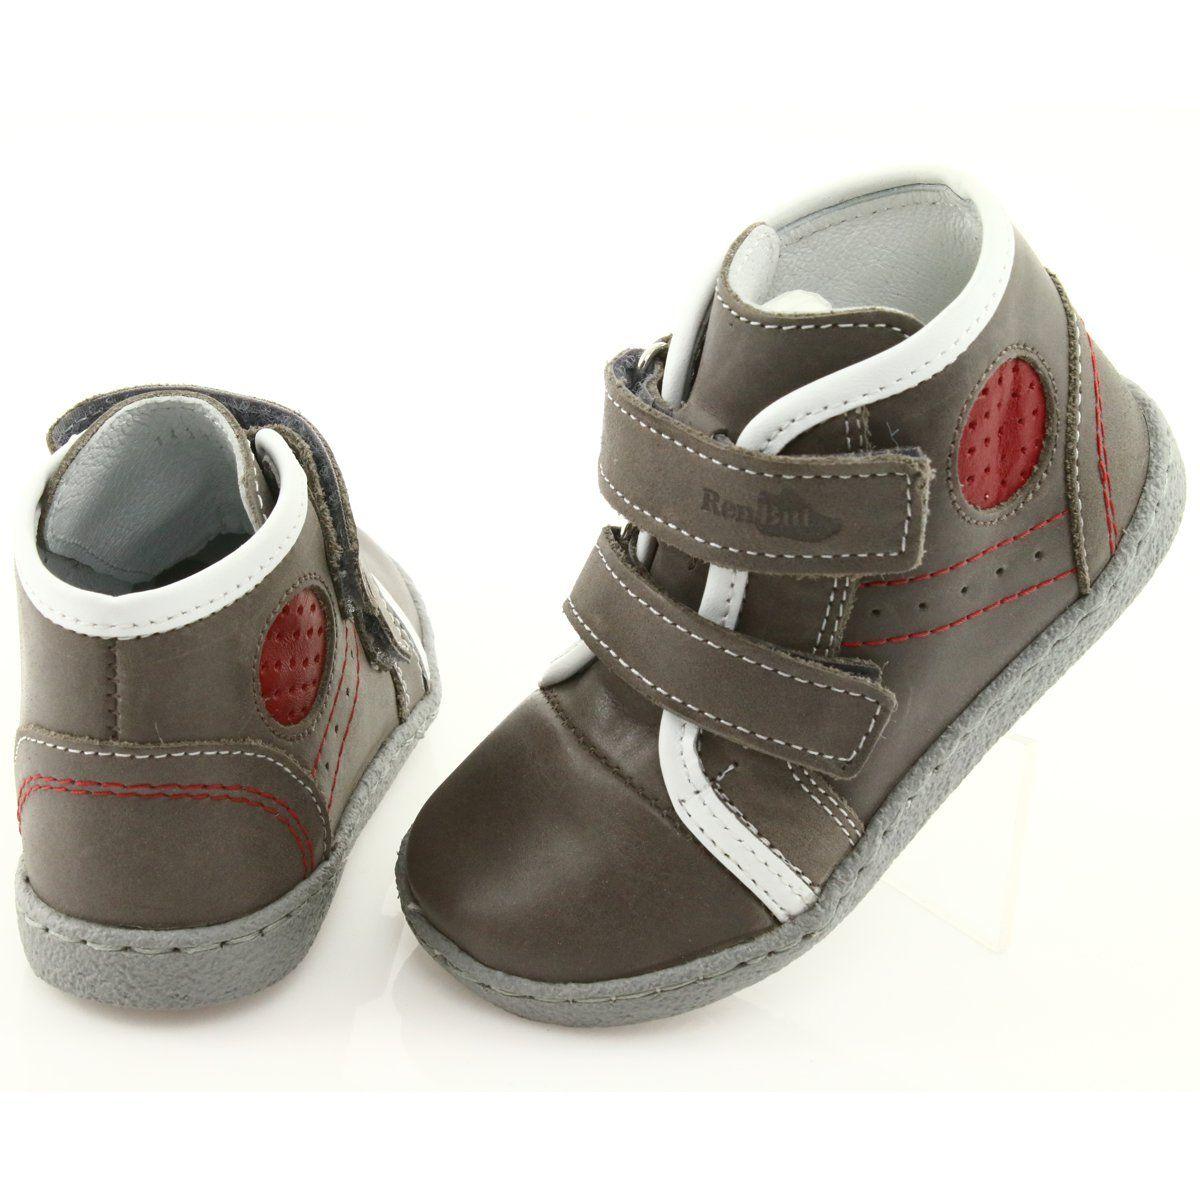 Trzewiki Chlopiece Ren But 1423 Szare Czerwone Boys Shoes Kid Shoes Childrens Shoes